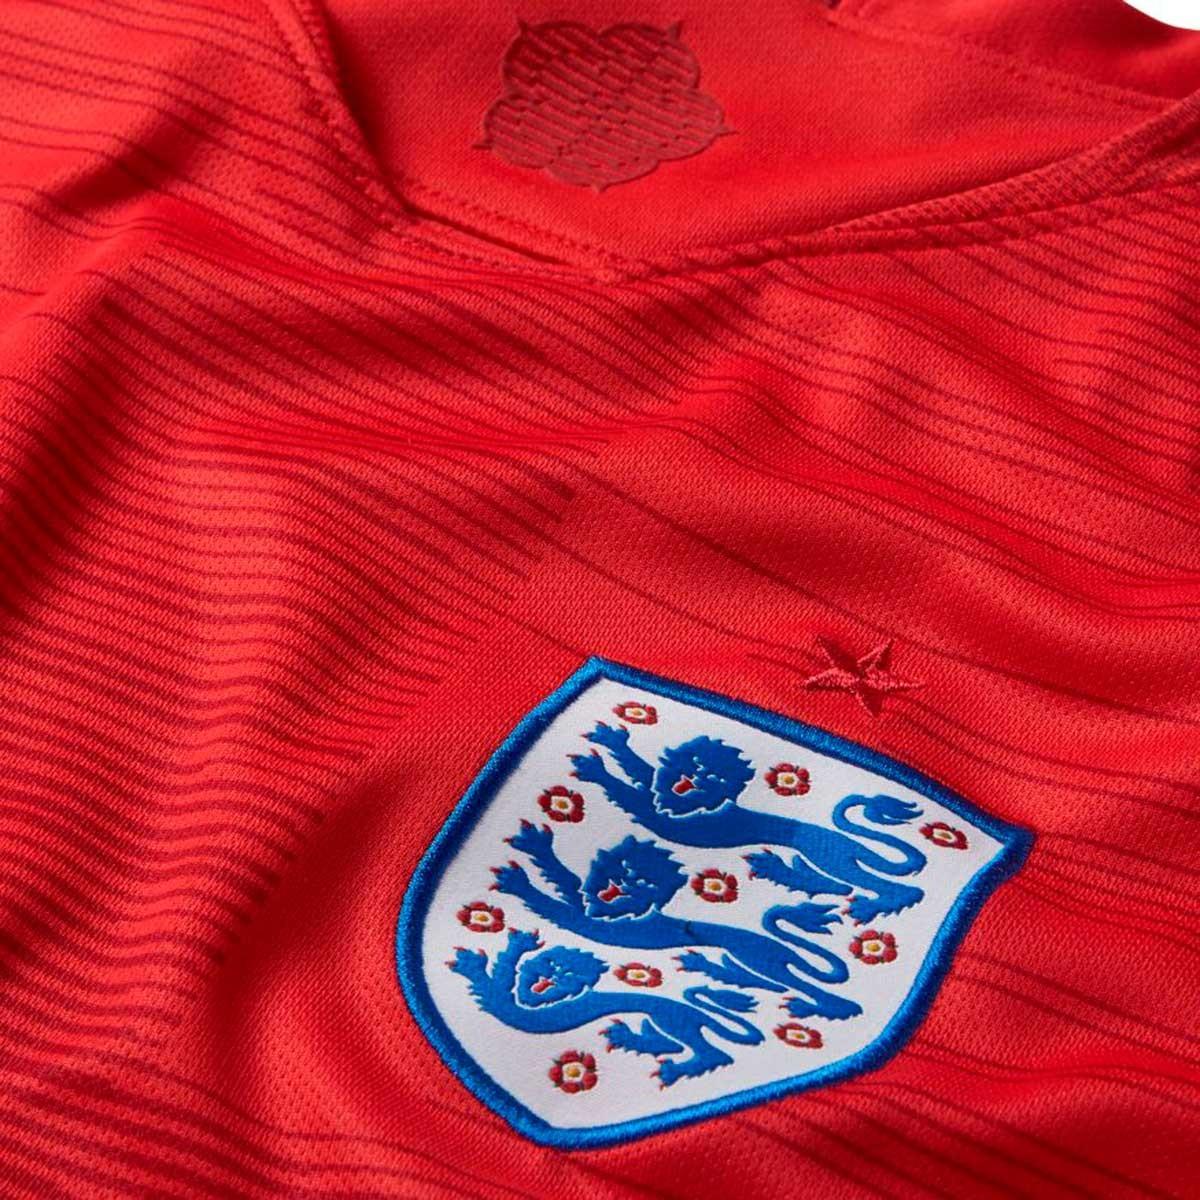 Camiseta Nike Inglaterra Stadium Segunda Equipación 2018-2019 Niño  Challenge red-Gym red-White - Soloporteros es ahora Fútbol Emotion 03177478dfdda